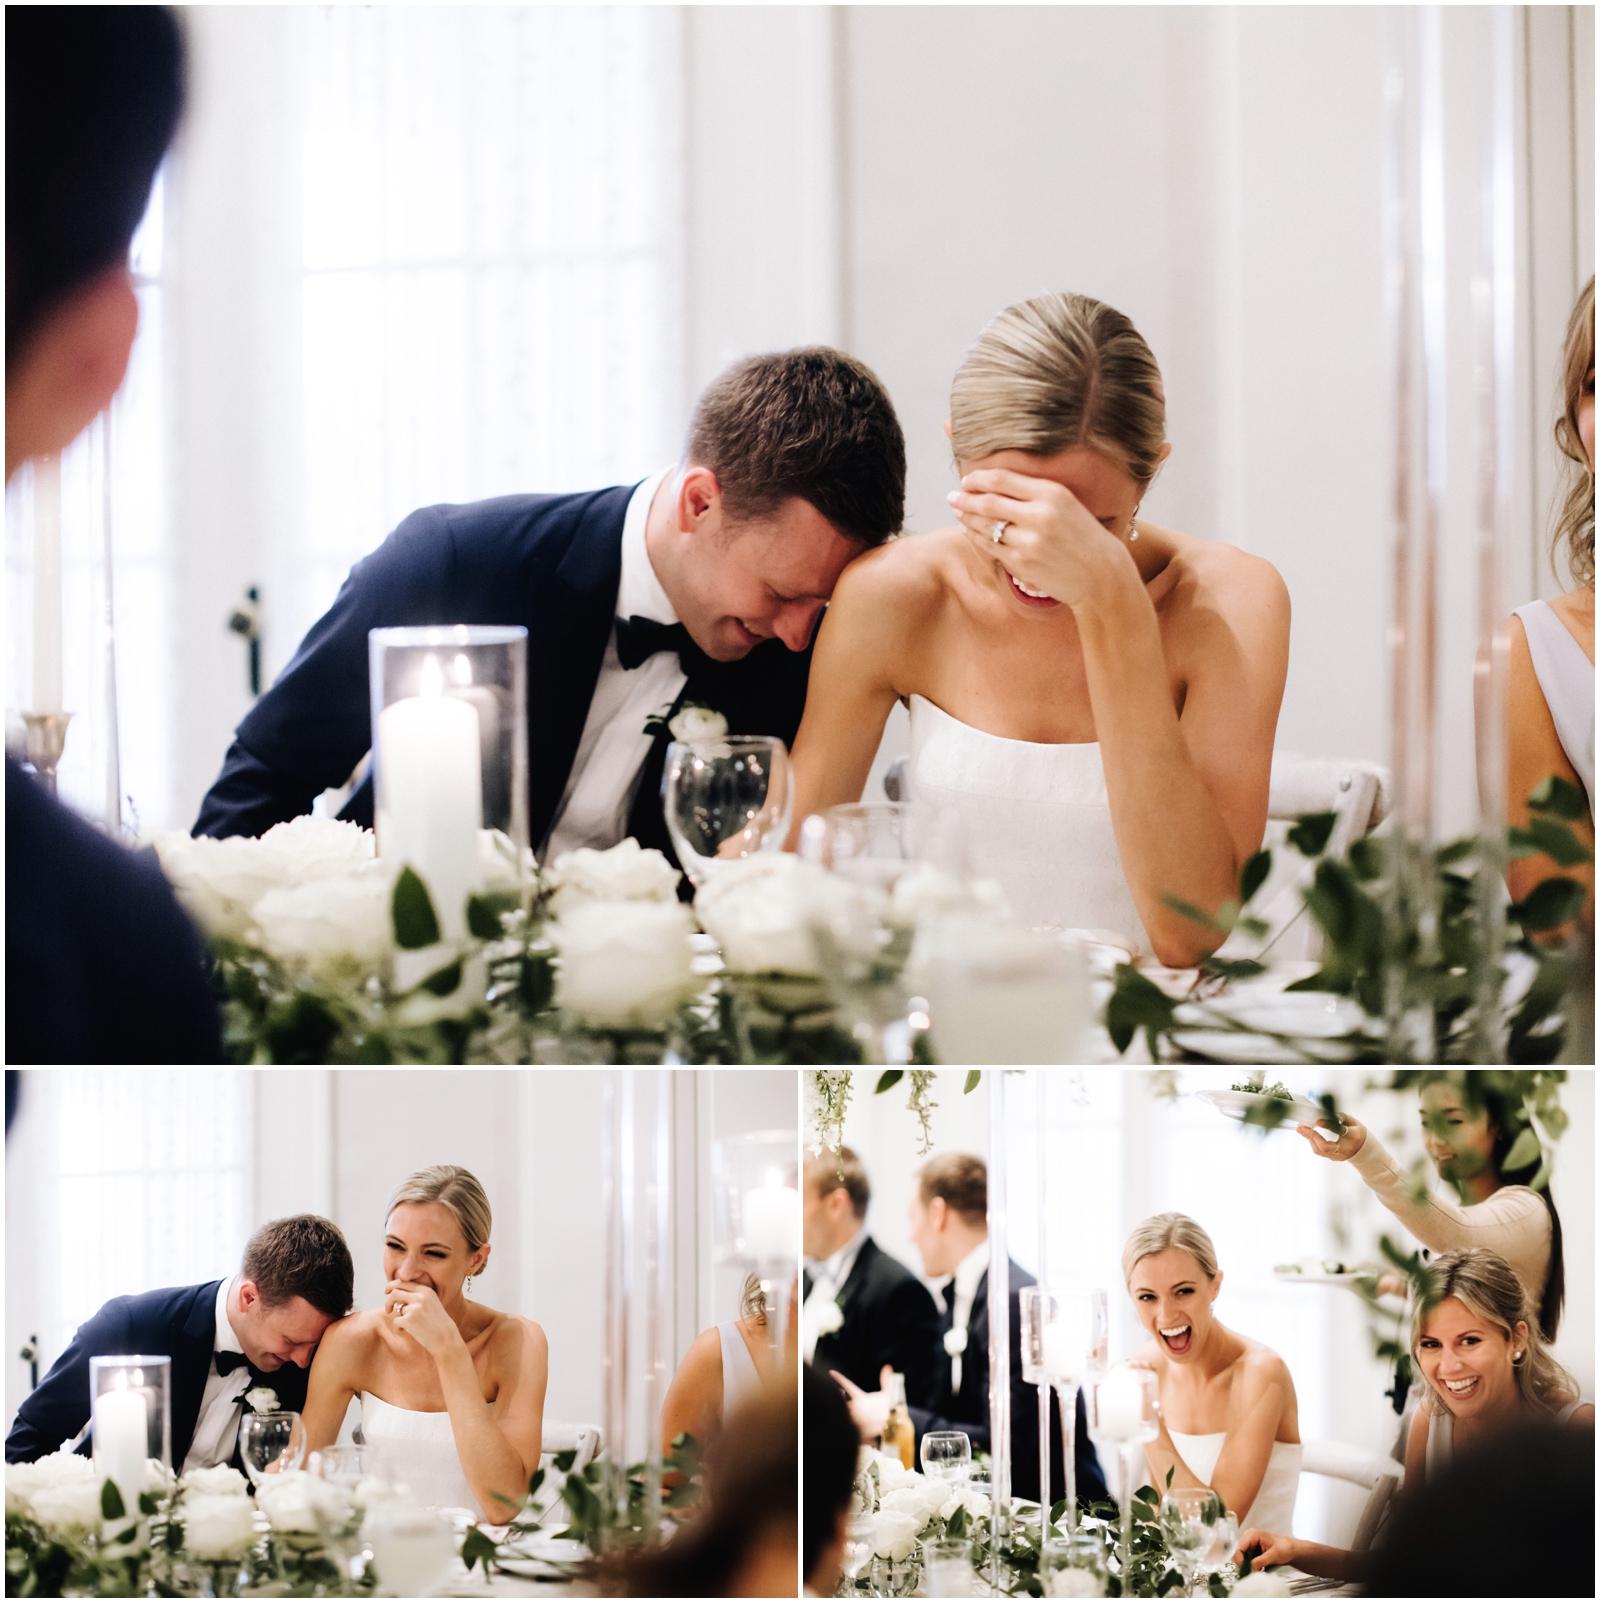 Minnesota Wedding Planner. Lafayette Club Wedding. Wedding Reception Inspiration. Wedding Decor. Greenery Wedding. Bride and groom laughing at the reception